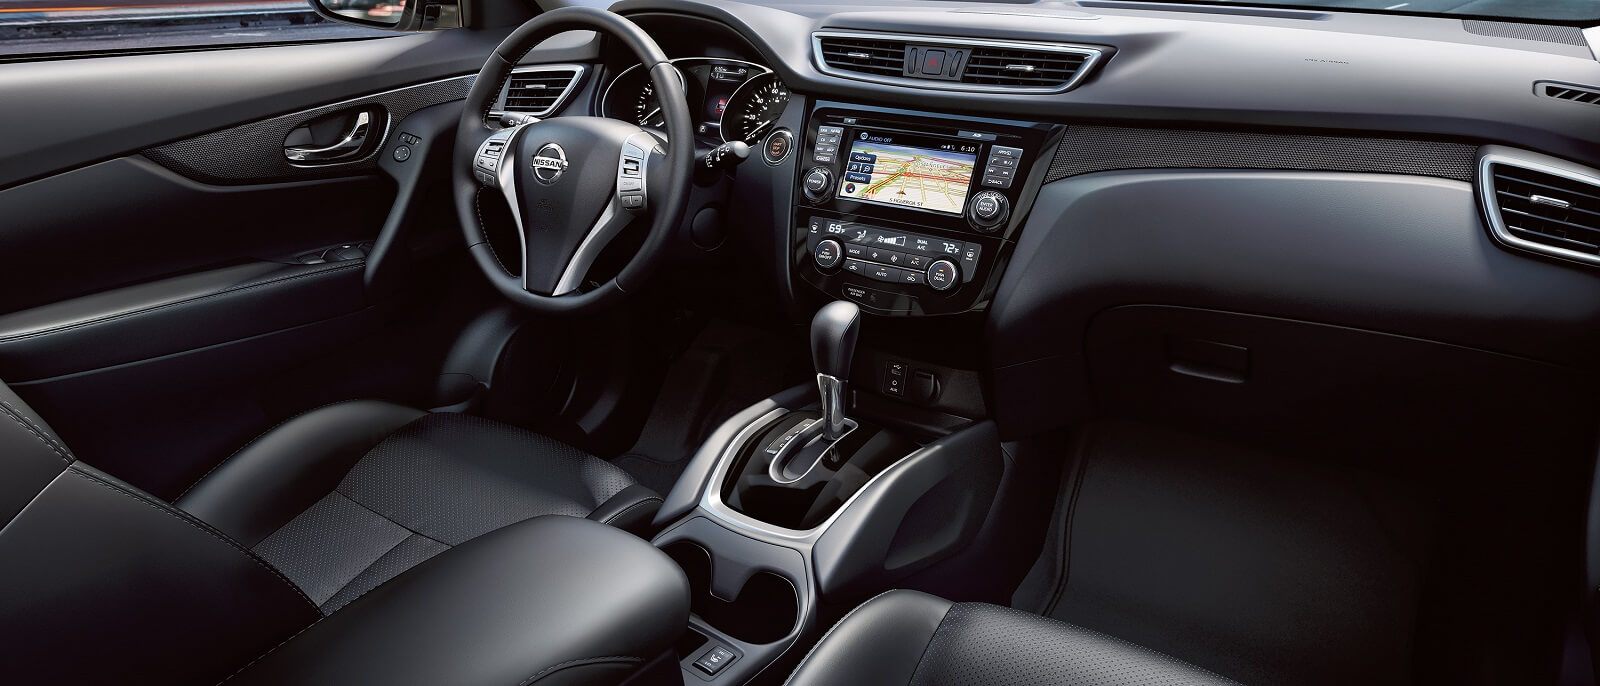 2016 Nissan Rogue Interior Cabin